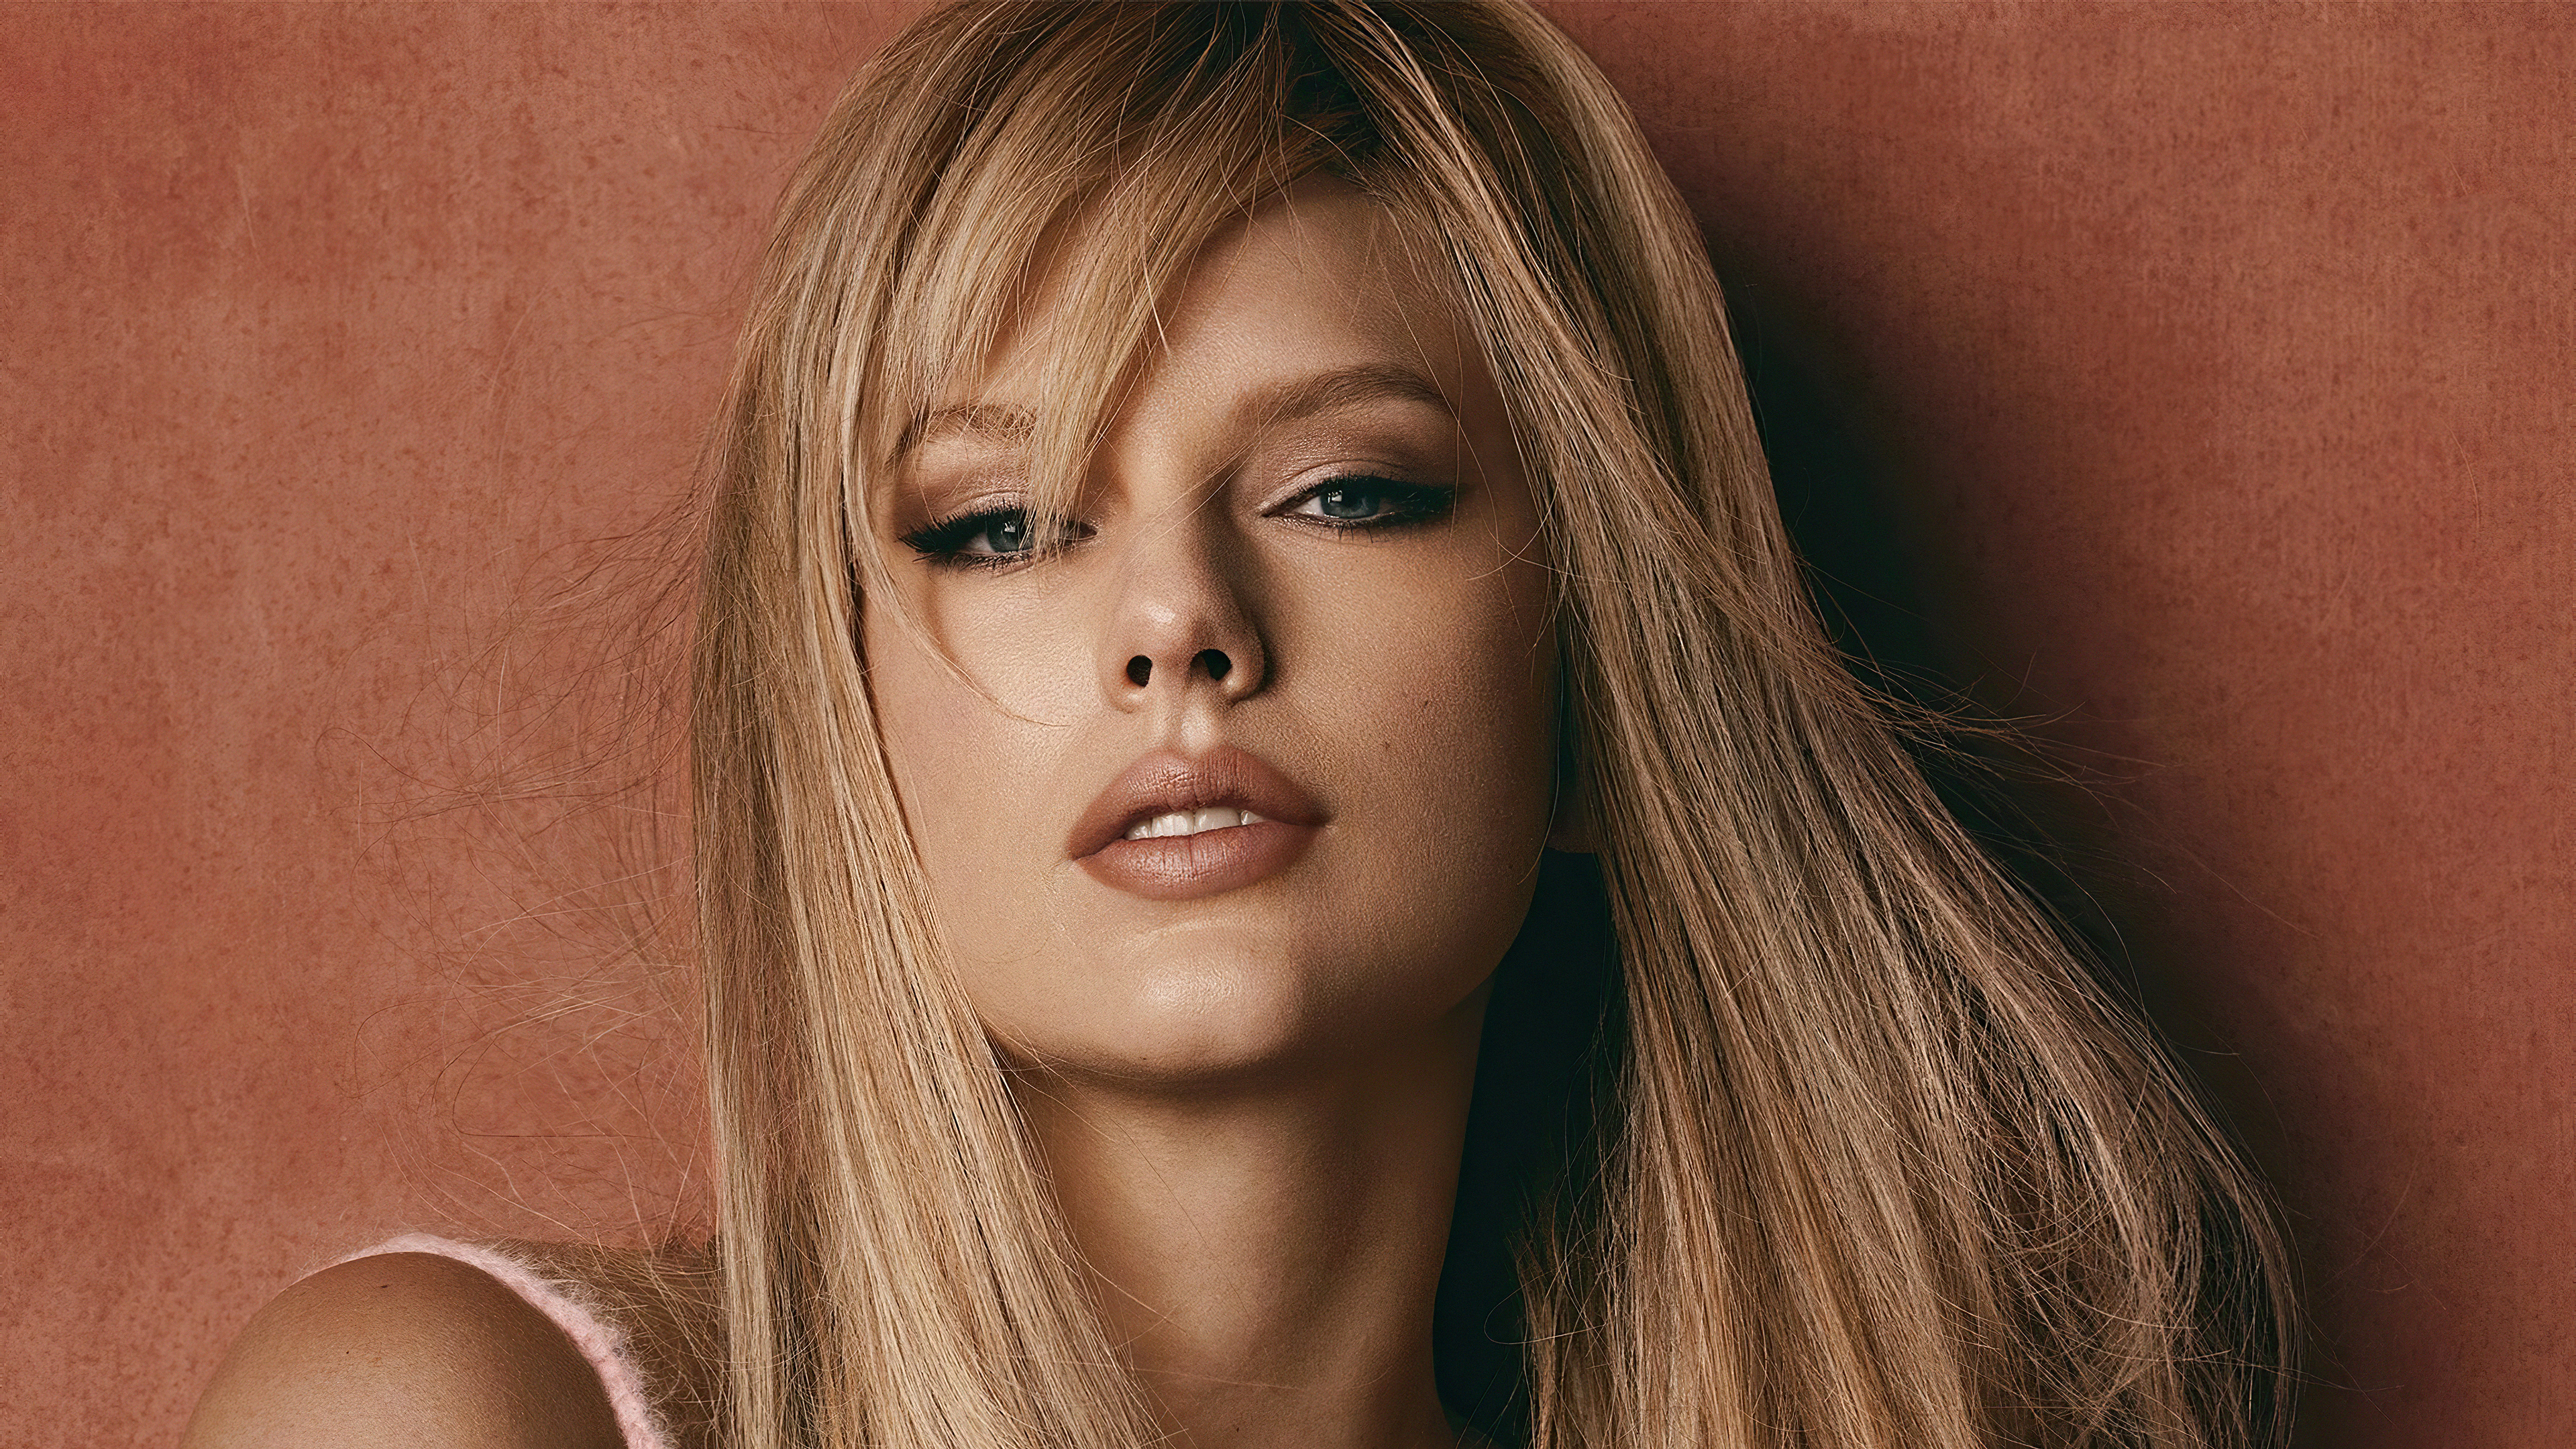 Taylor Swift for British VOGUE January 2020 4k Ultra HD Wallpaper 3840x2160